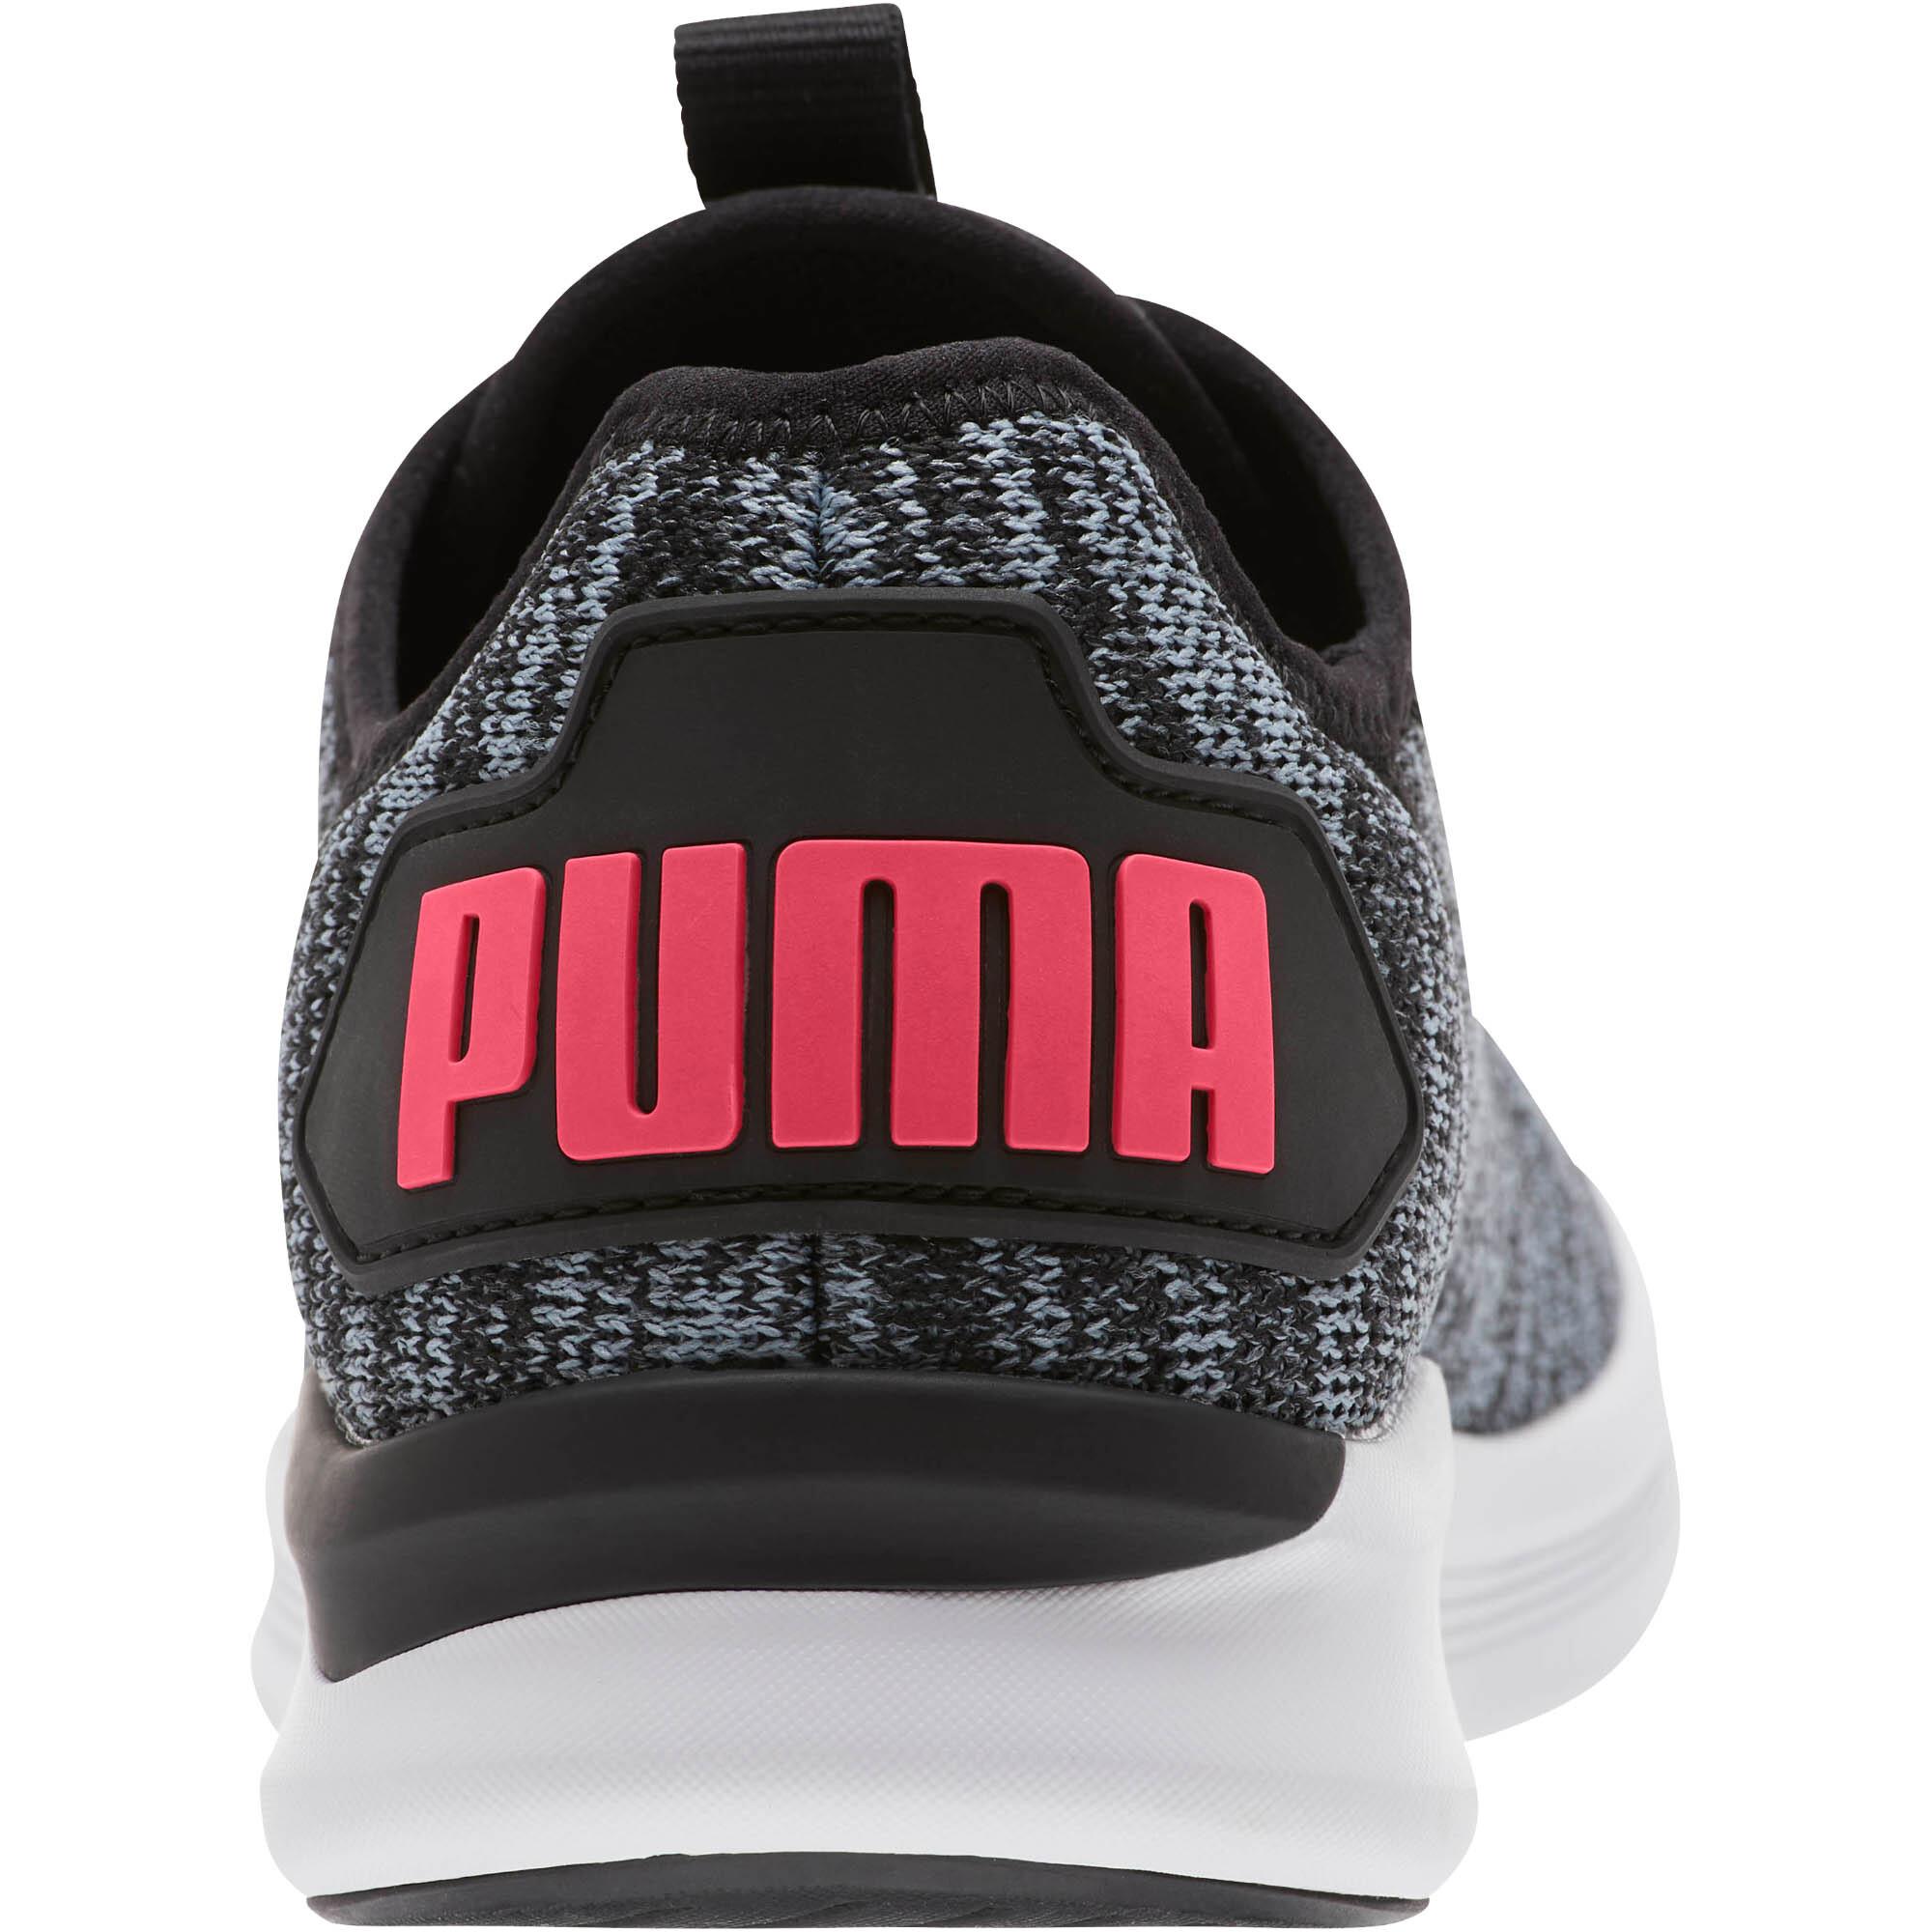 PUMA-Ballast-Women-039-s-Running-Shoes-Women-Shoe-Running thumbnail 8